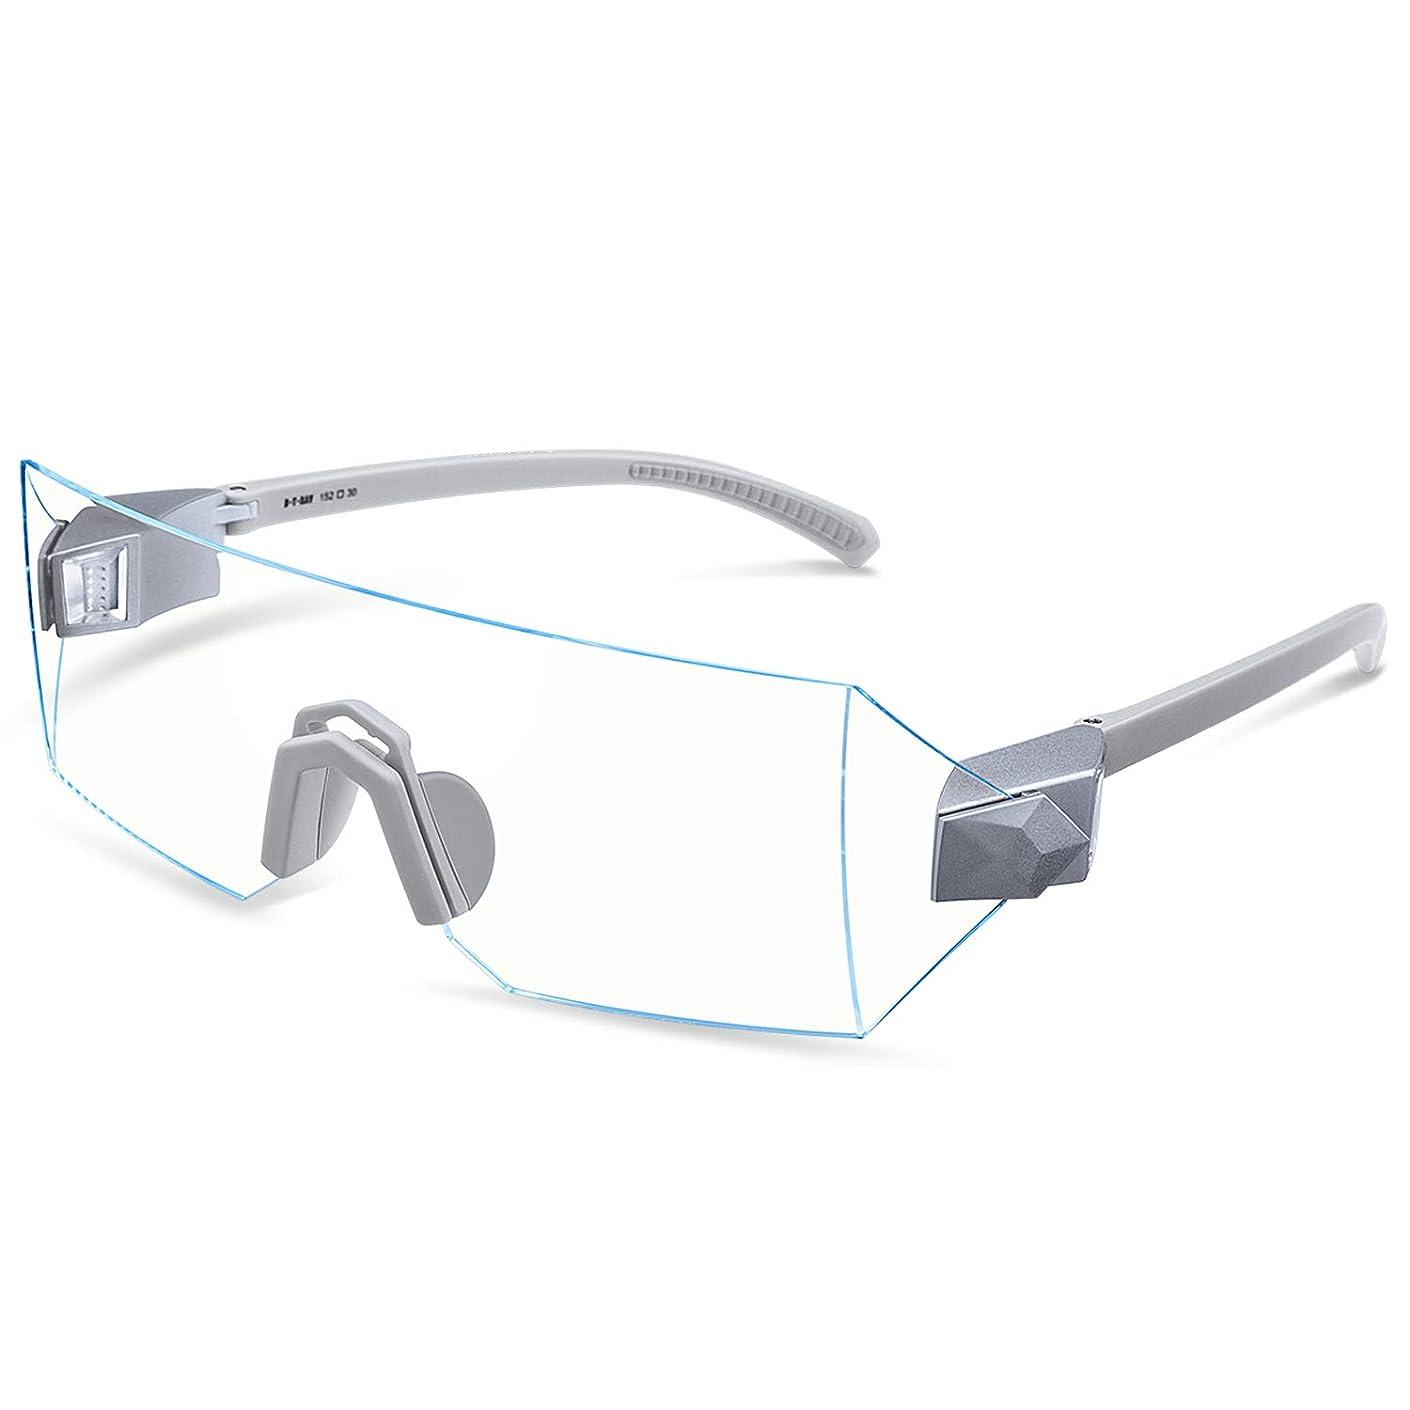 Blue Light Blocking Glasses for Computer, Gaming, Reading and Reduce Eyestrain and Headache,Better Sleep Eyewear, Clear Lens, Men/Women